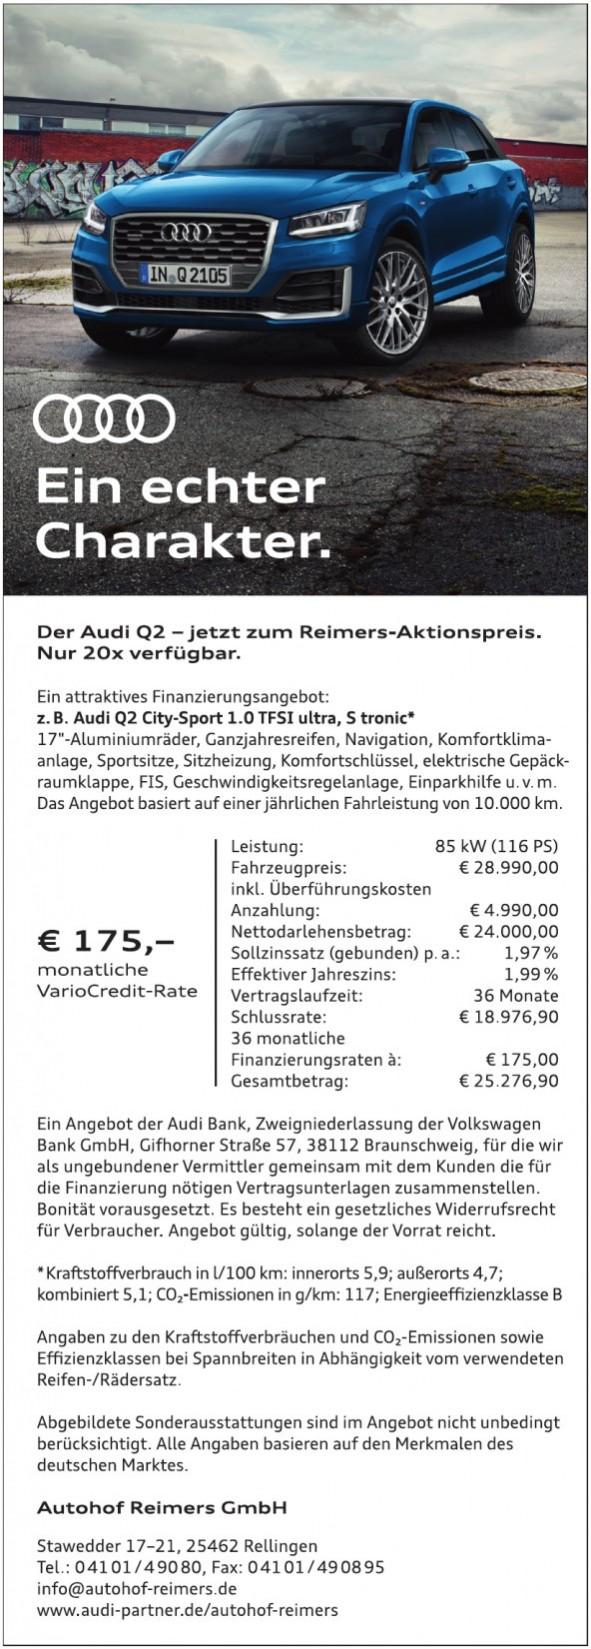 Autohof Reimers GmbH in Rellingen